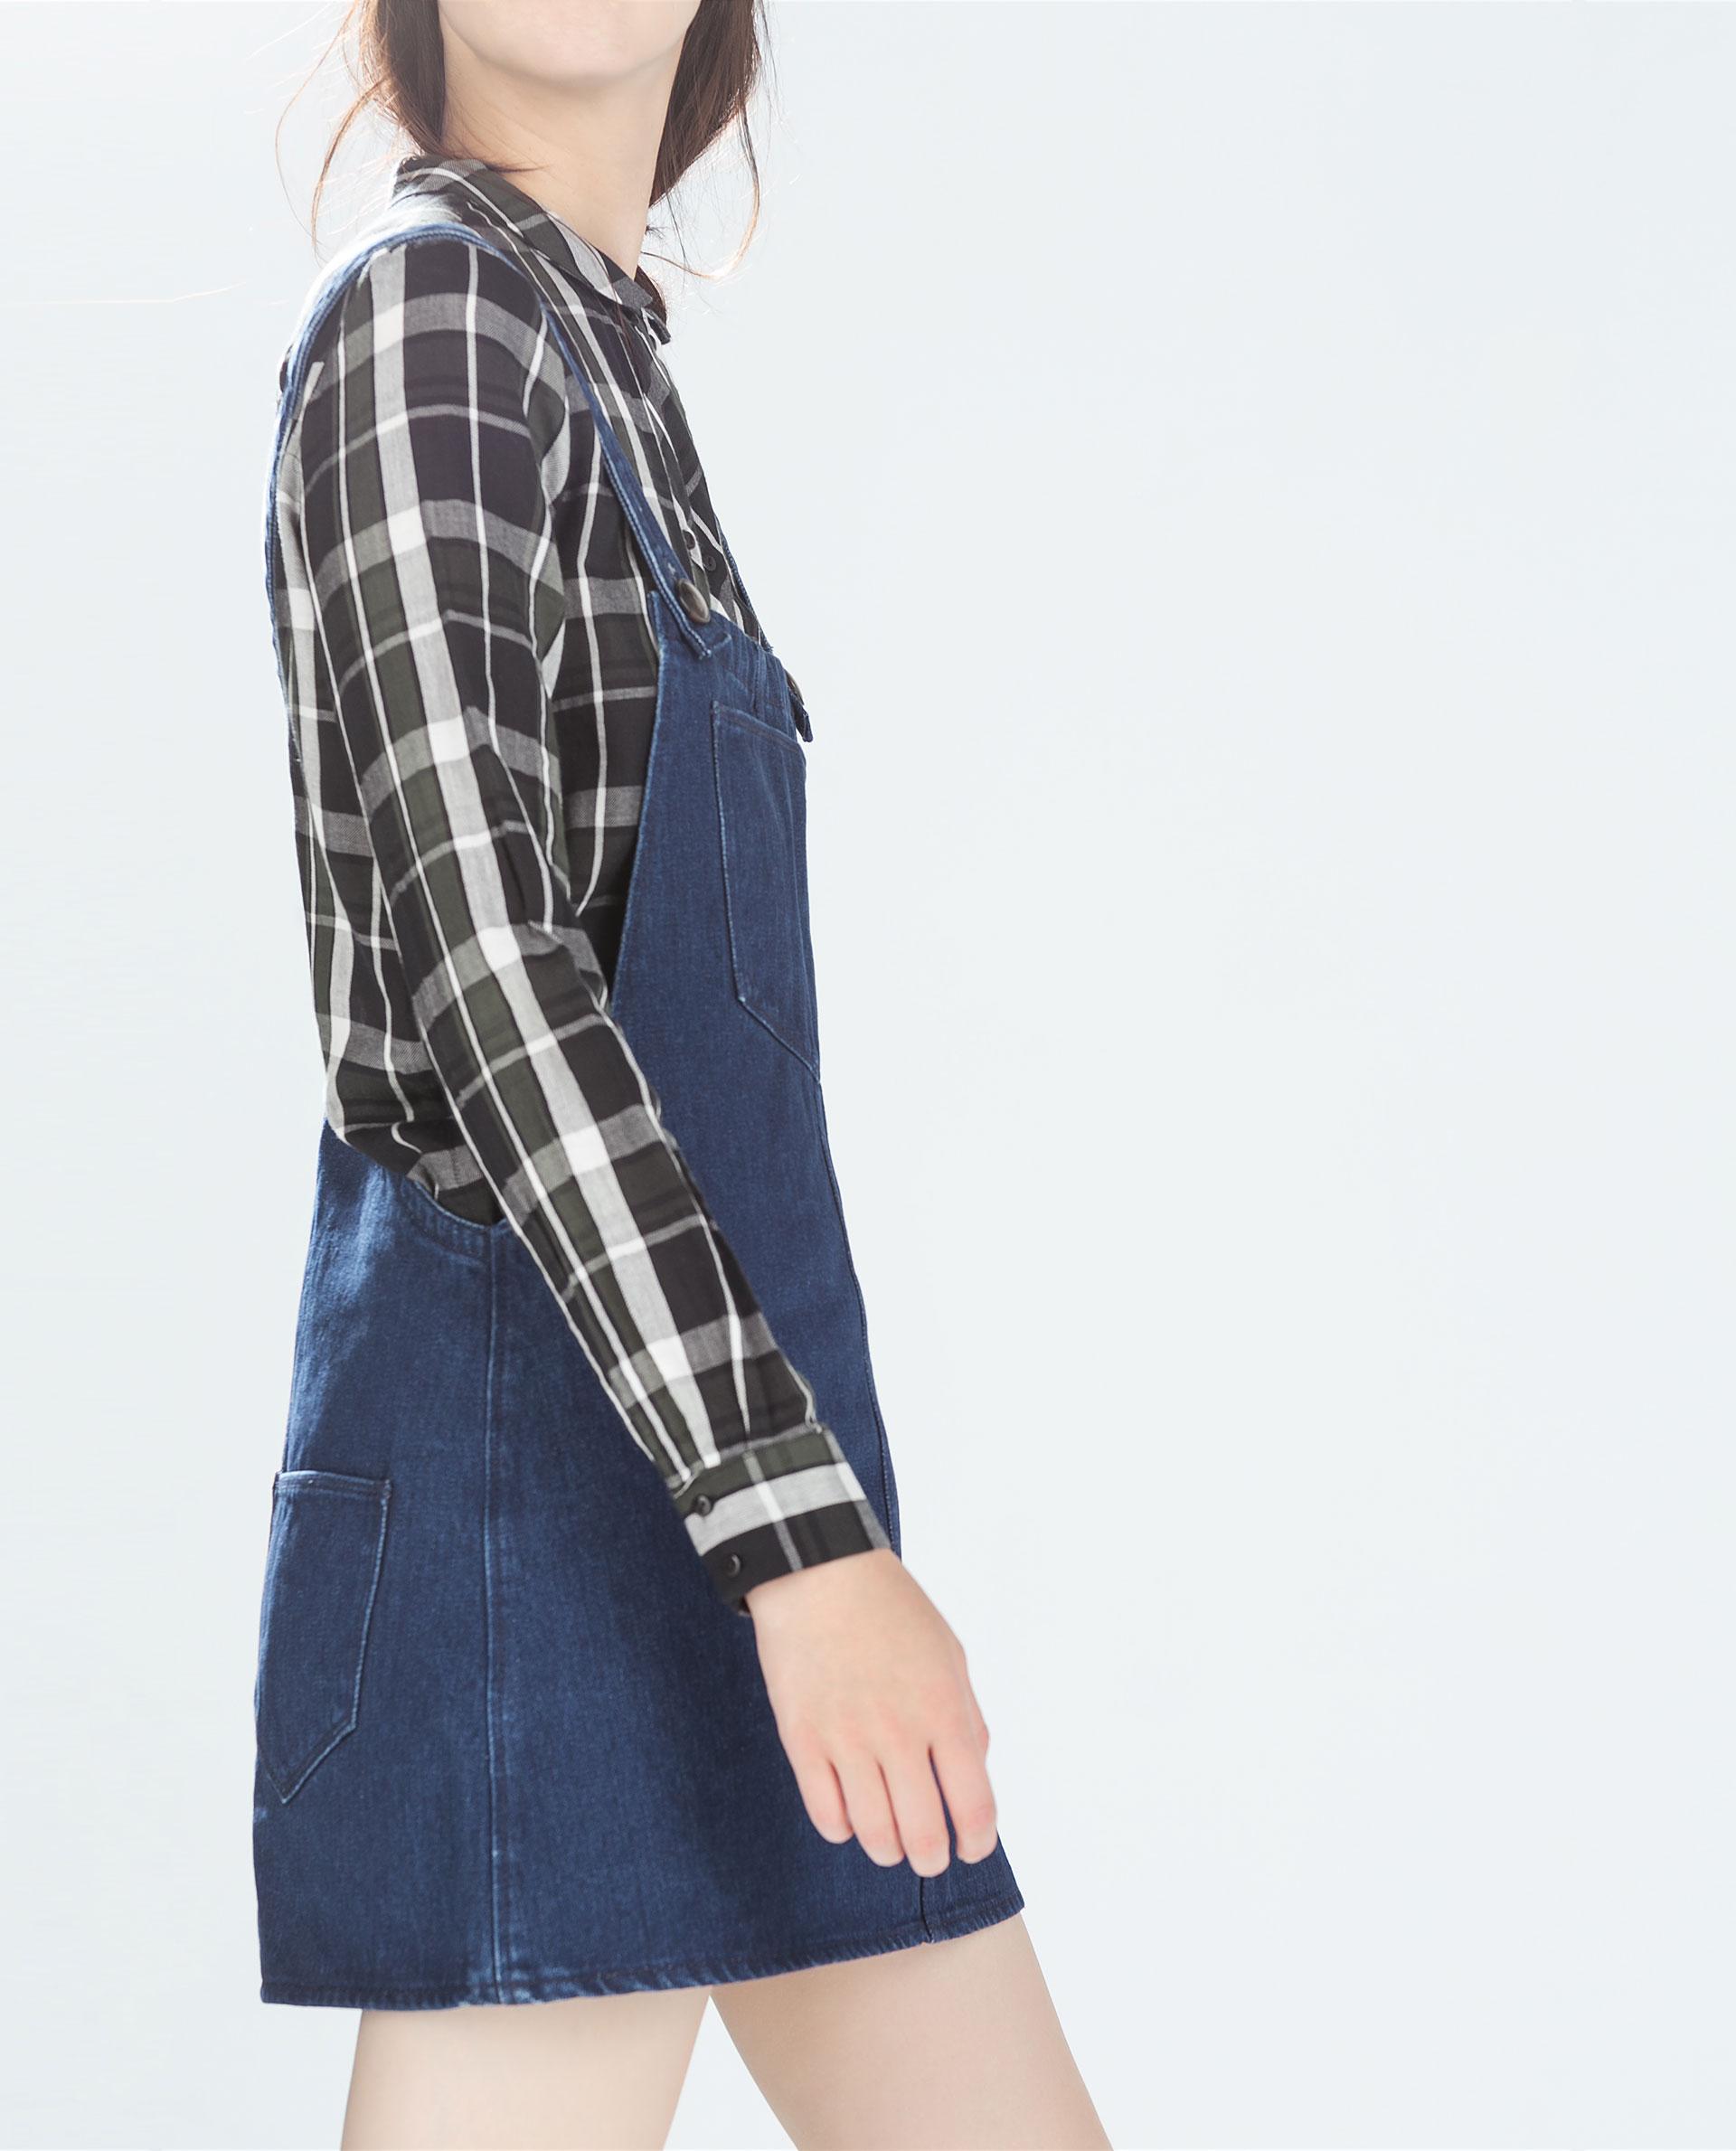 Creative Denim Jumper Dress Women  Oasis Amor Fashion